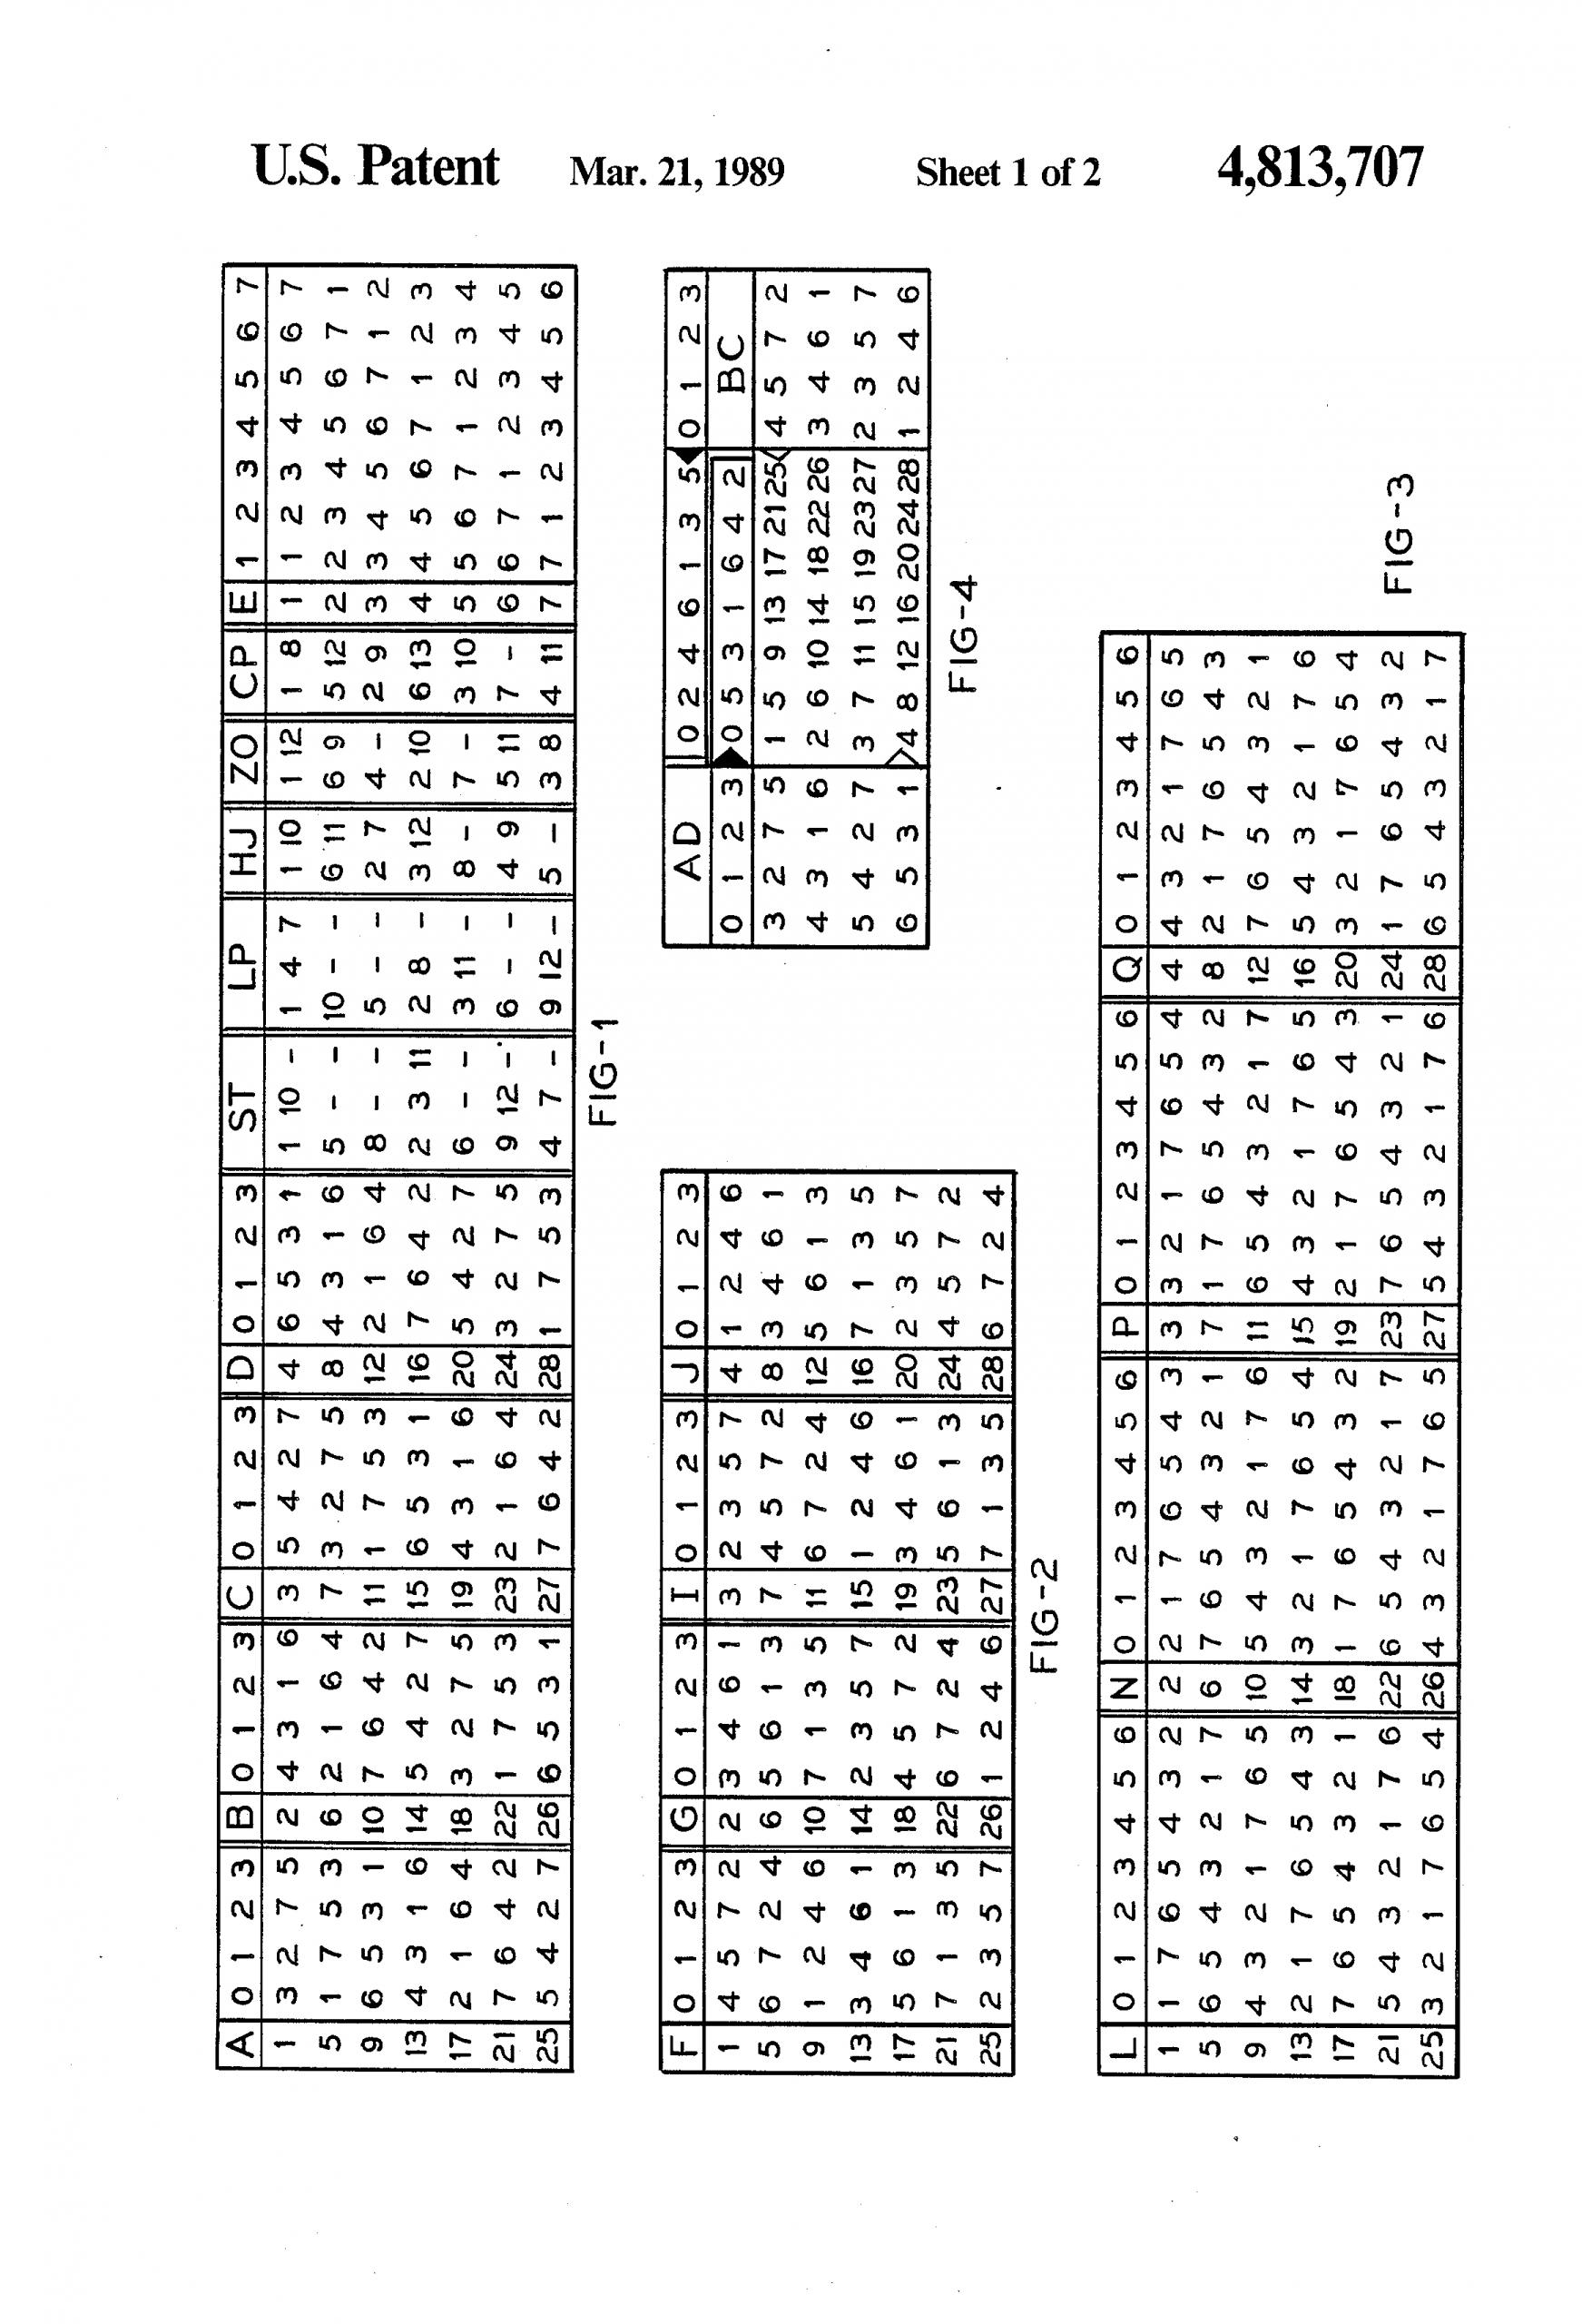 Perpetual Julian Calendar | Printable Calendar Template 2021 intended for Julian Calendar Perpetual 2021